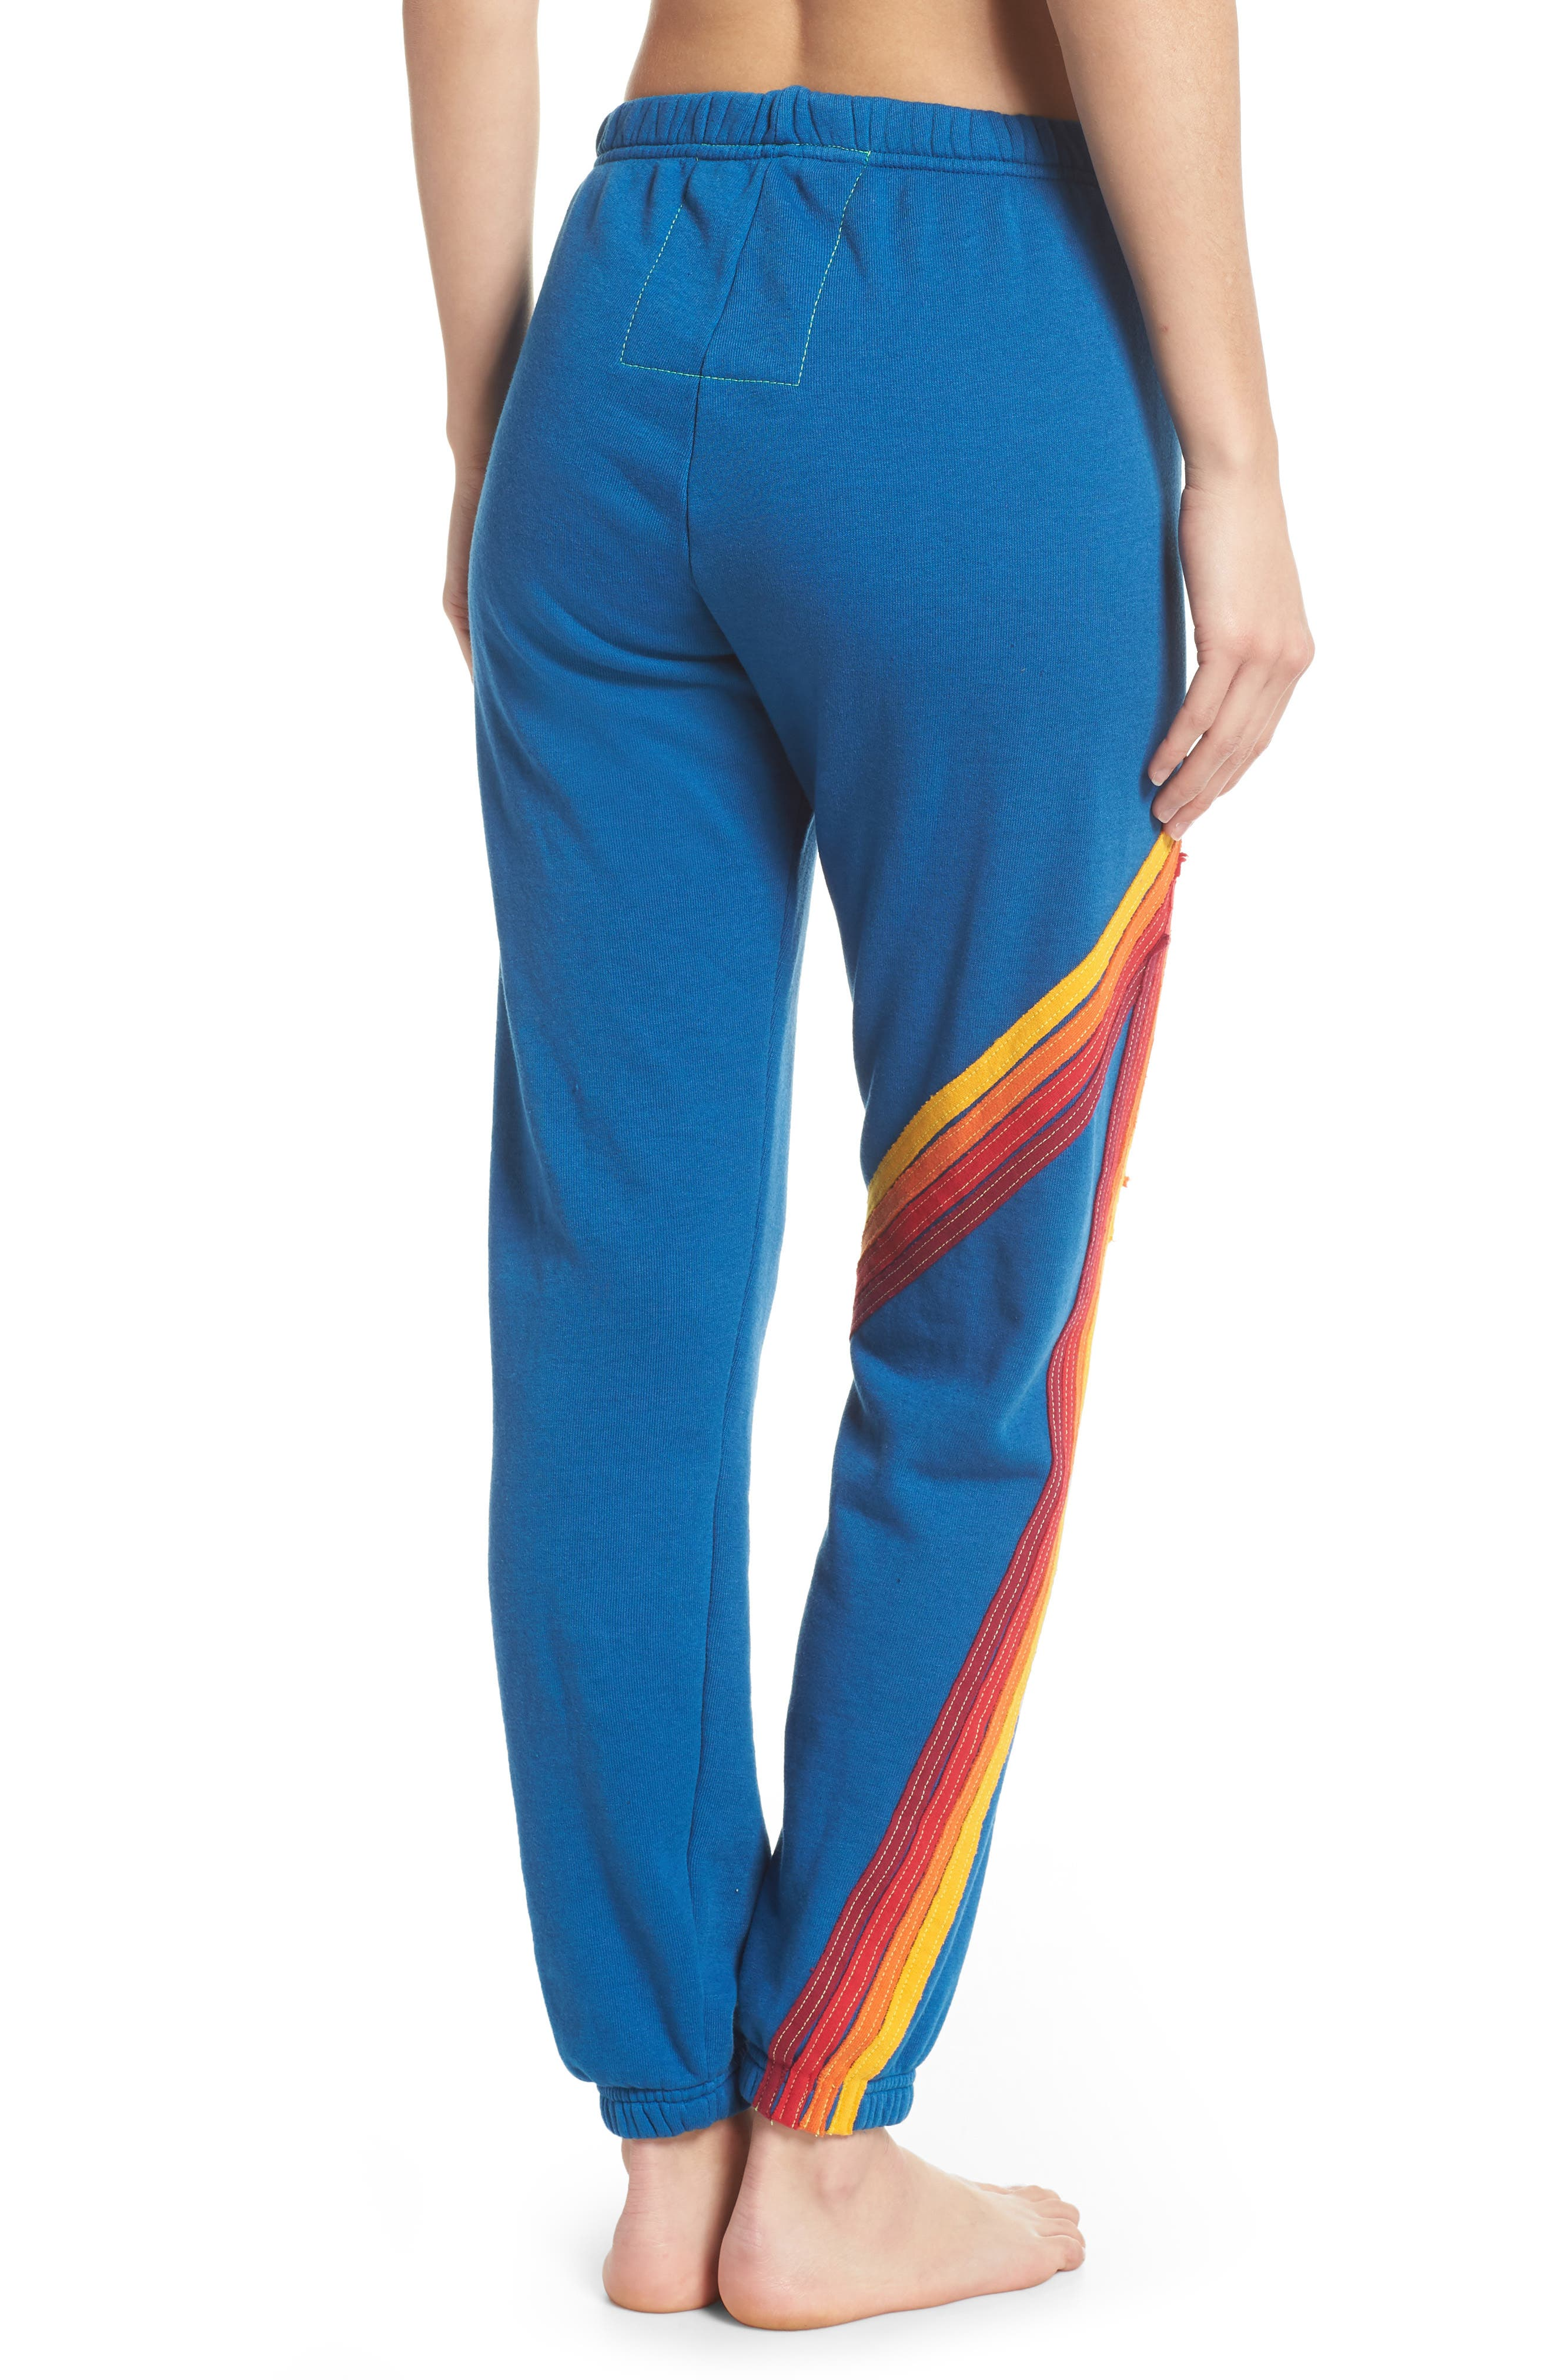 Blaze 4 Sweatpants,                             Alternate thumbnail 2, color,                             Caribbean/ Red Stripe